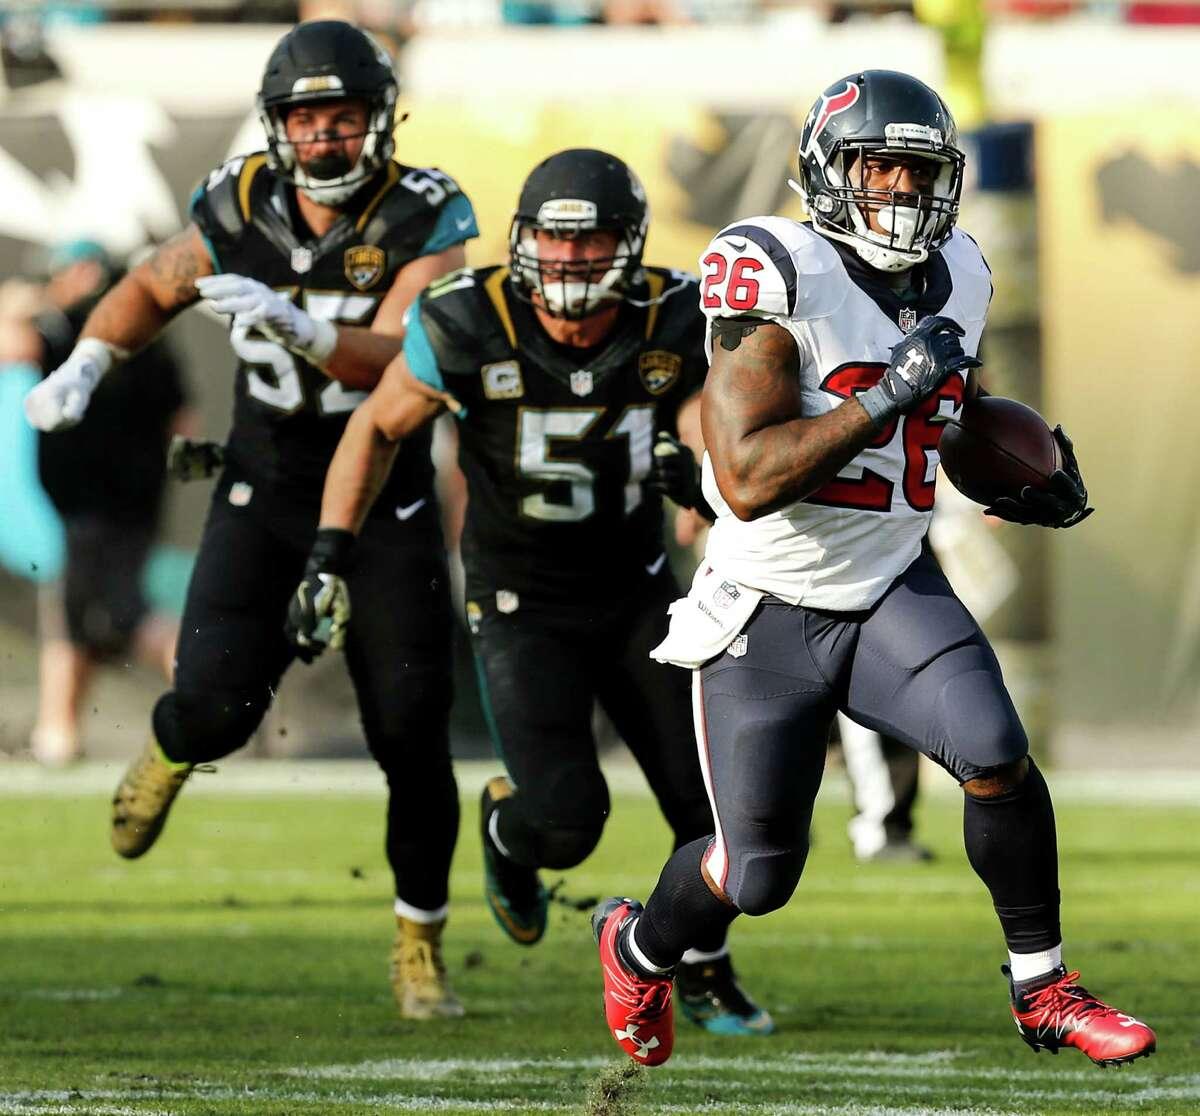 Lamar Miller had 83 of the Texans' 181 rushing yards against the Jaguars.